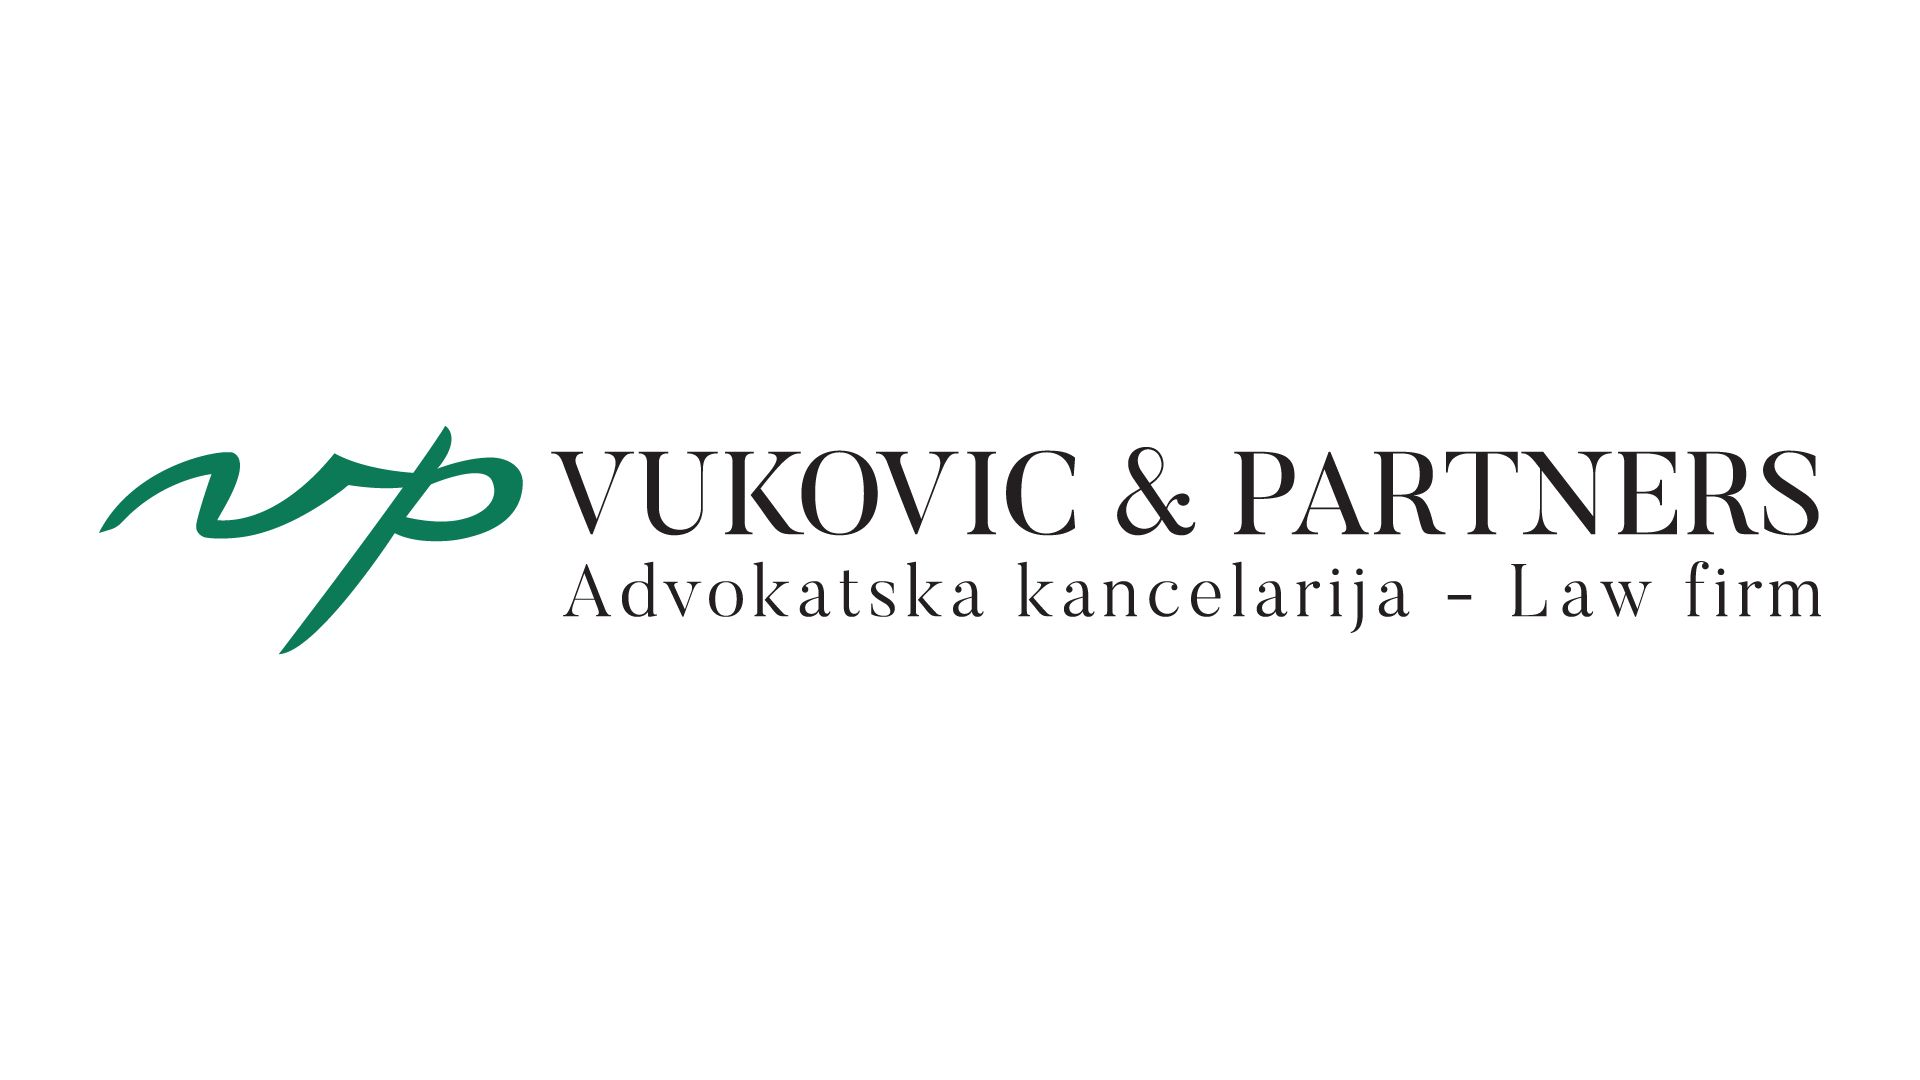 Vuković i partneri